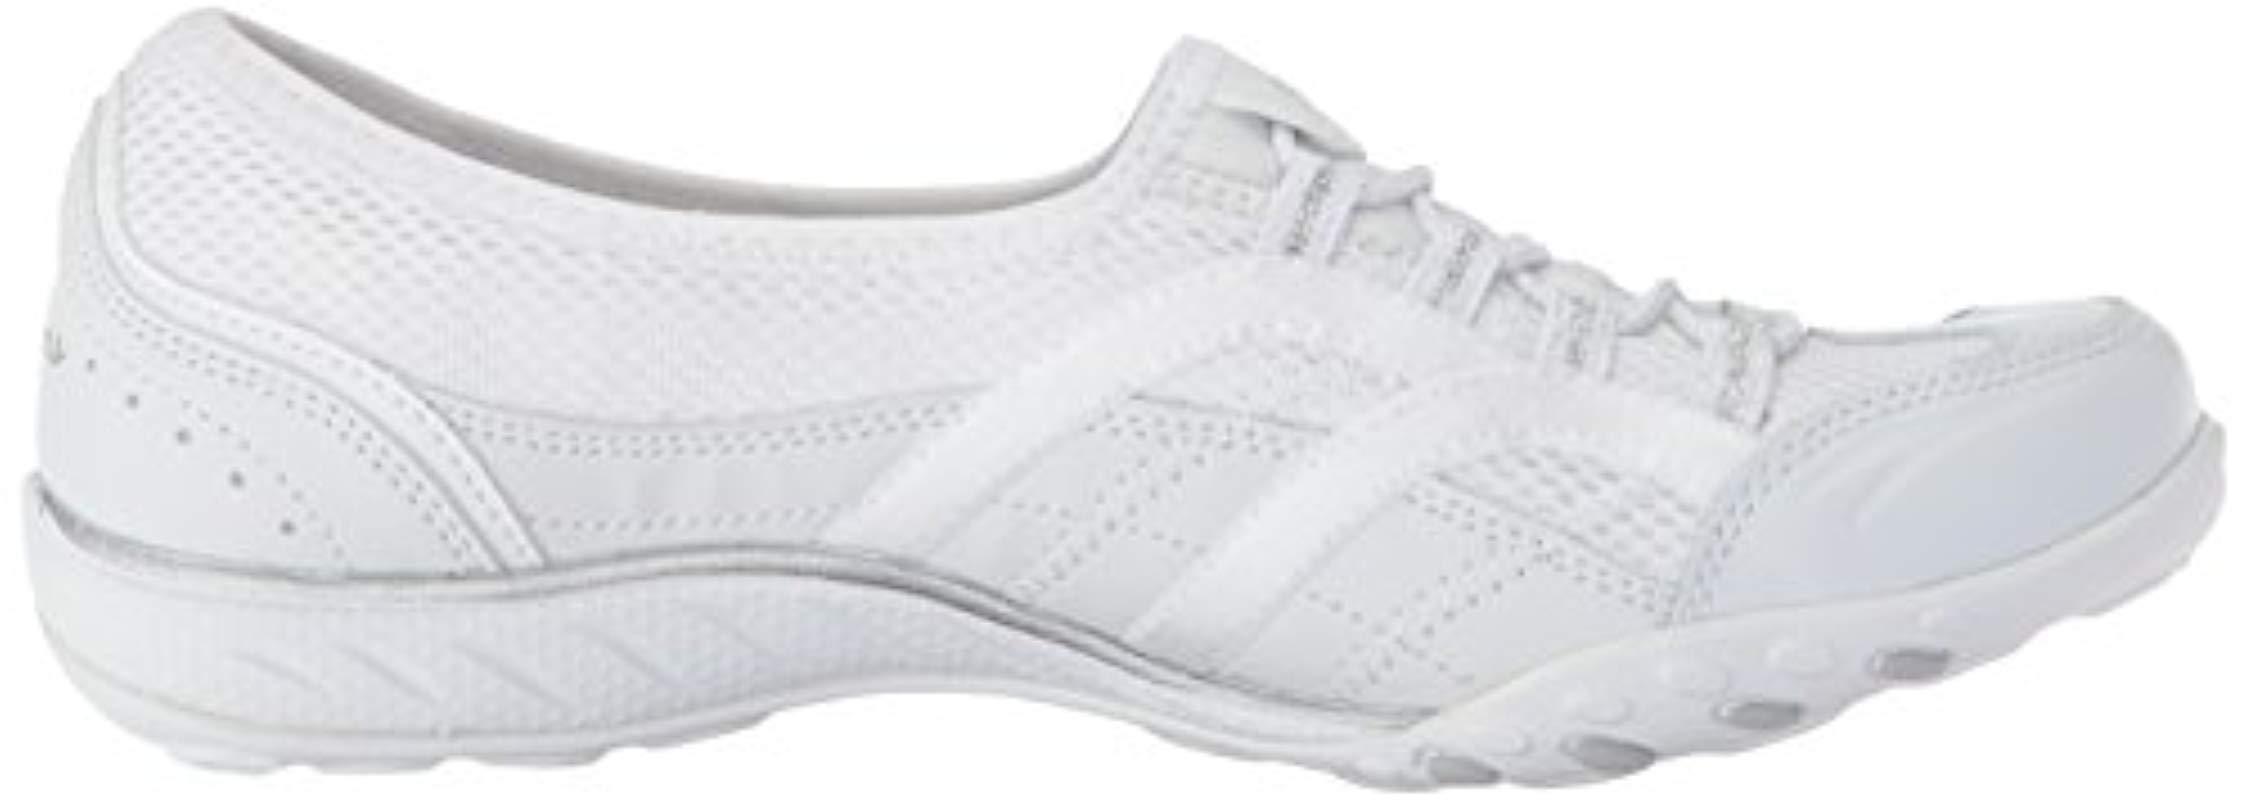 Breathe Easy-Well Versed W Skechers de color Blanco